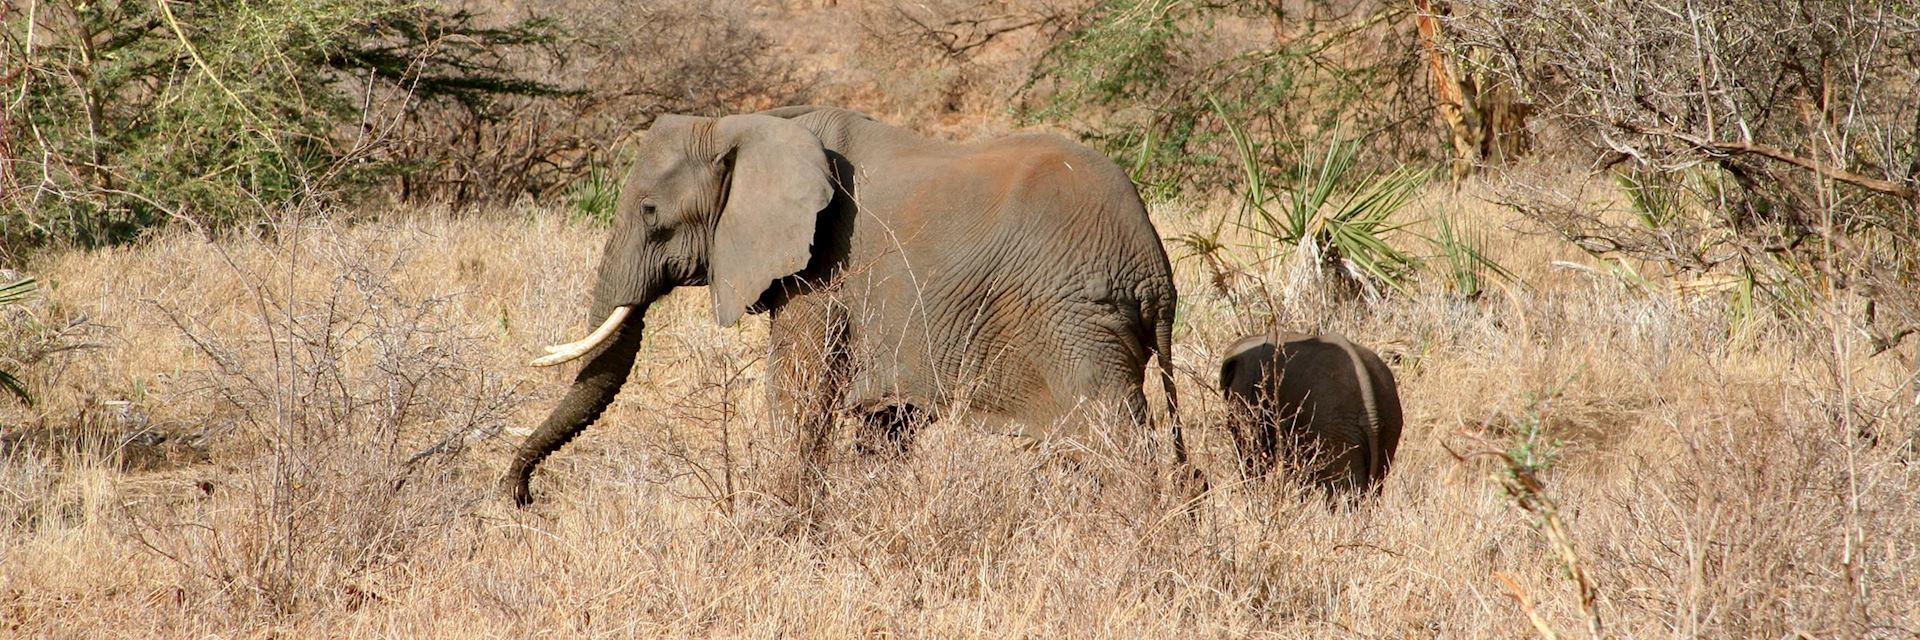 Elephant in the Meru National Park, Kenya